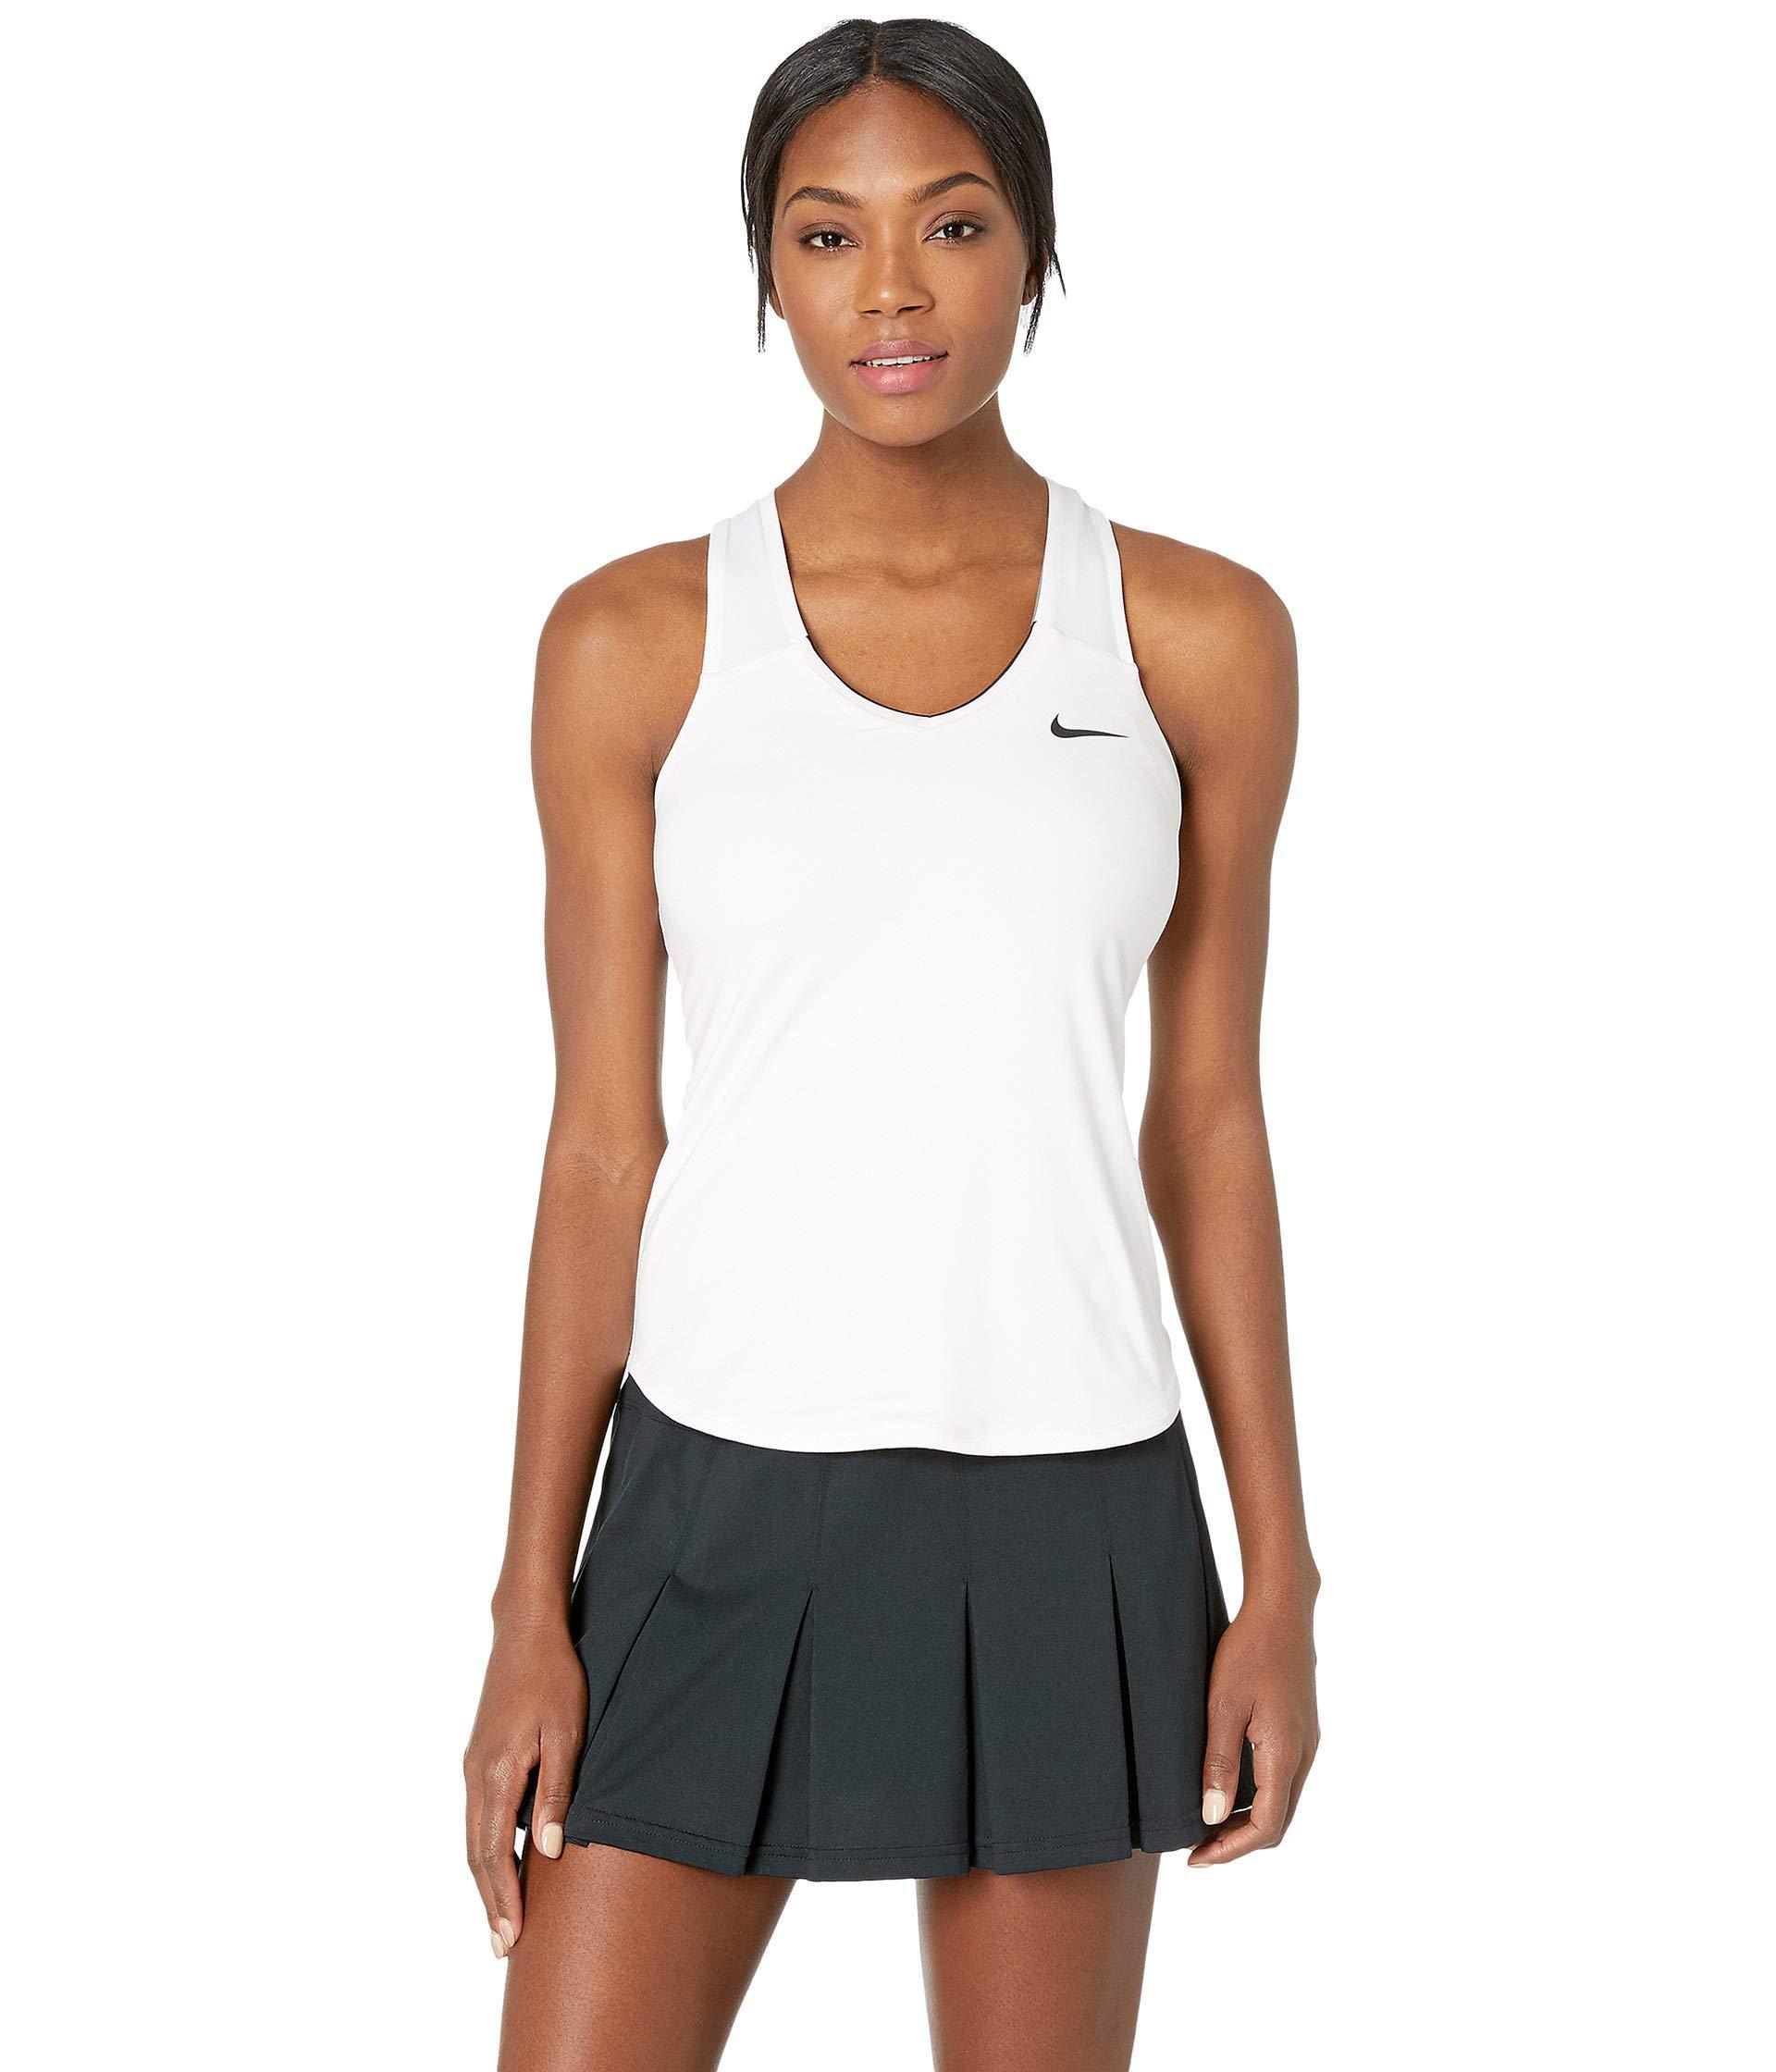 25104189d5b52 Nike Court Team Pure Tennis Tank Top (black/white) Women's ...